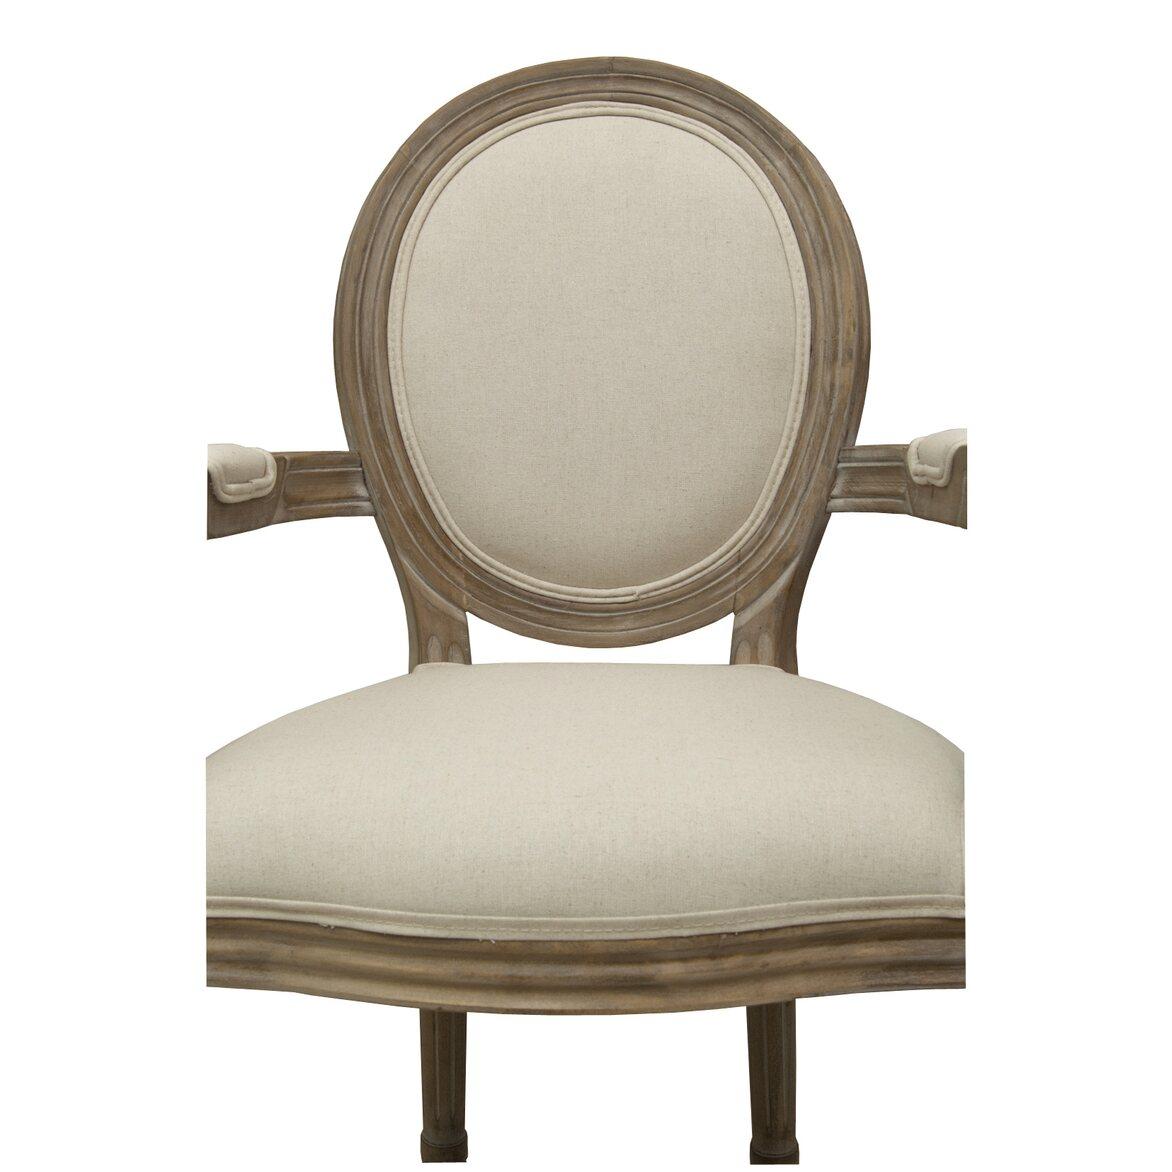 Стул Volker arm beige 5 | Обеденные стулья Kingsby